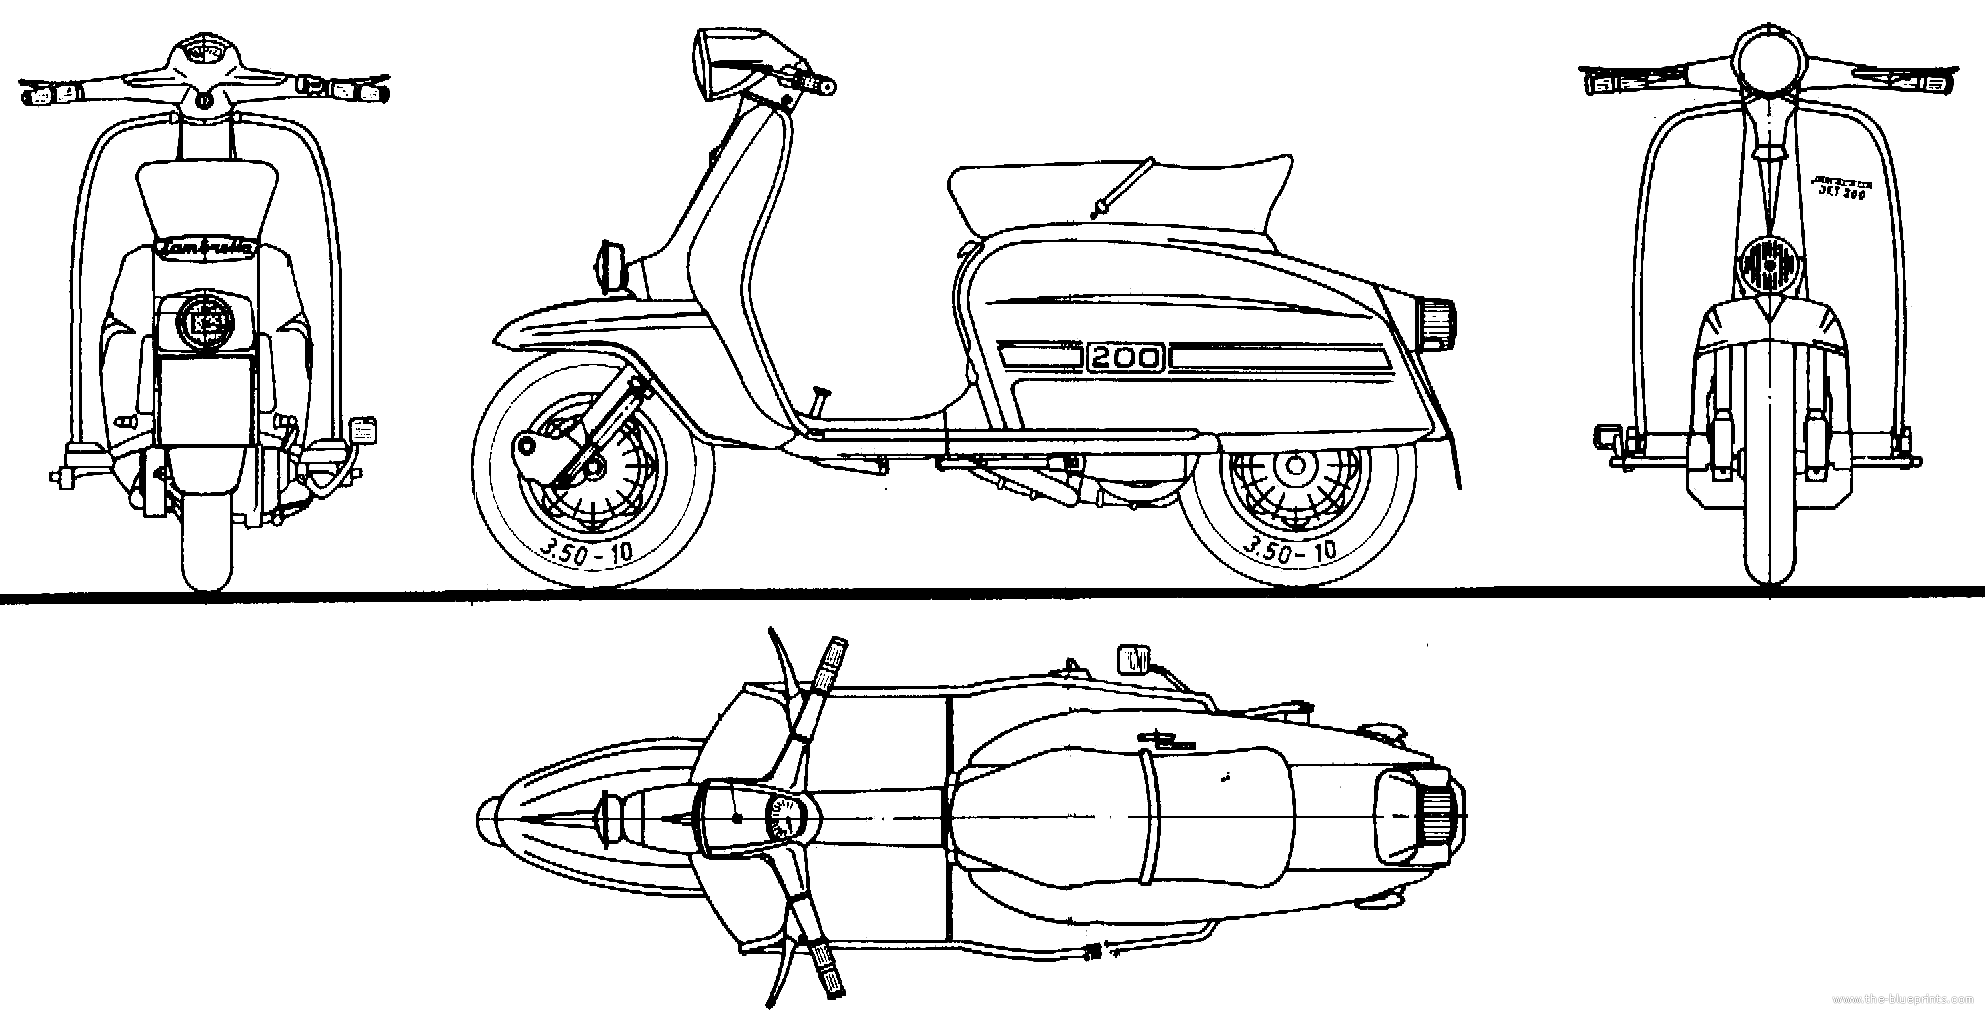 Lambretta Jet 200 Free Blueprint Cgfrog Com